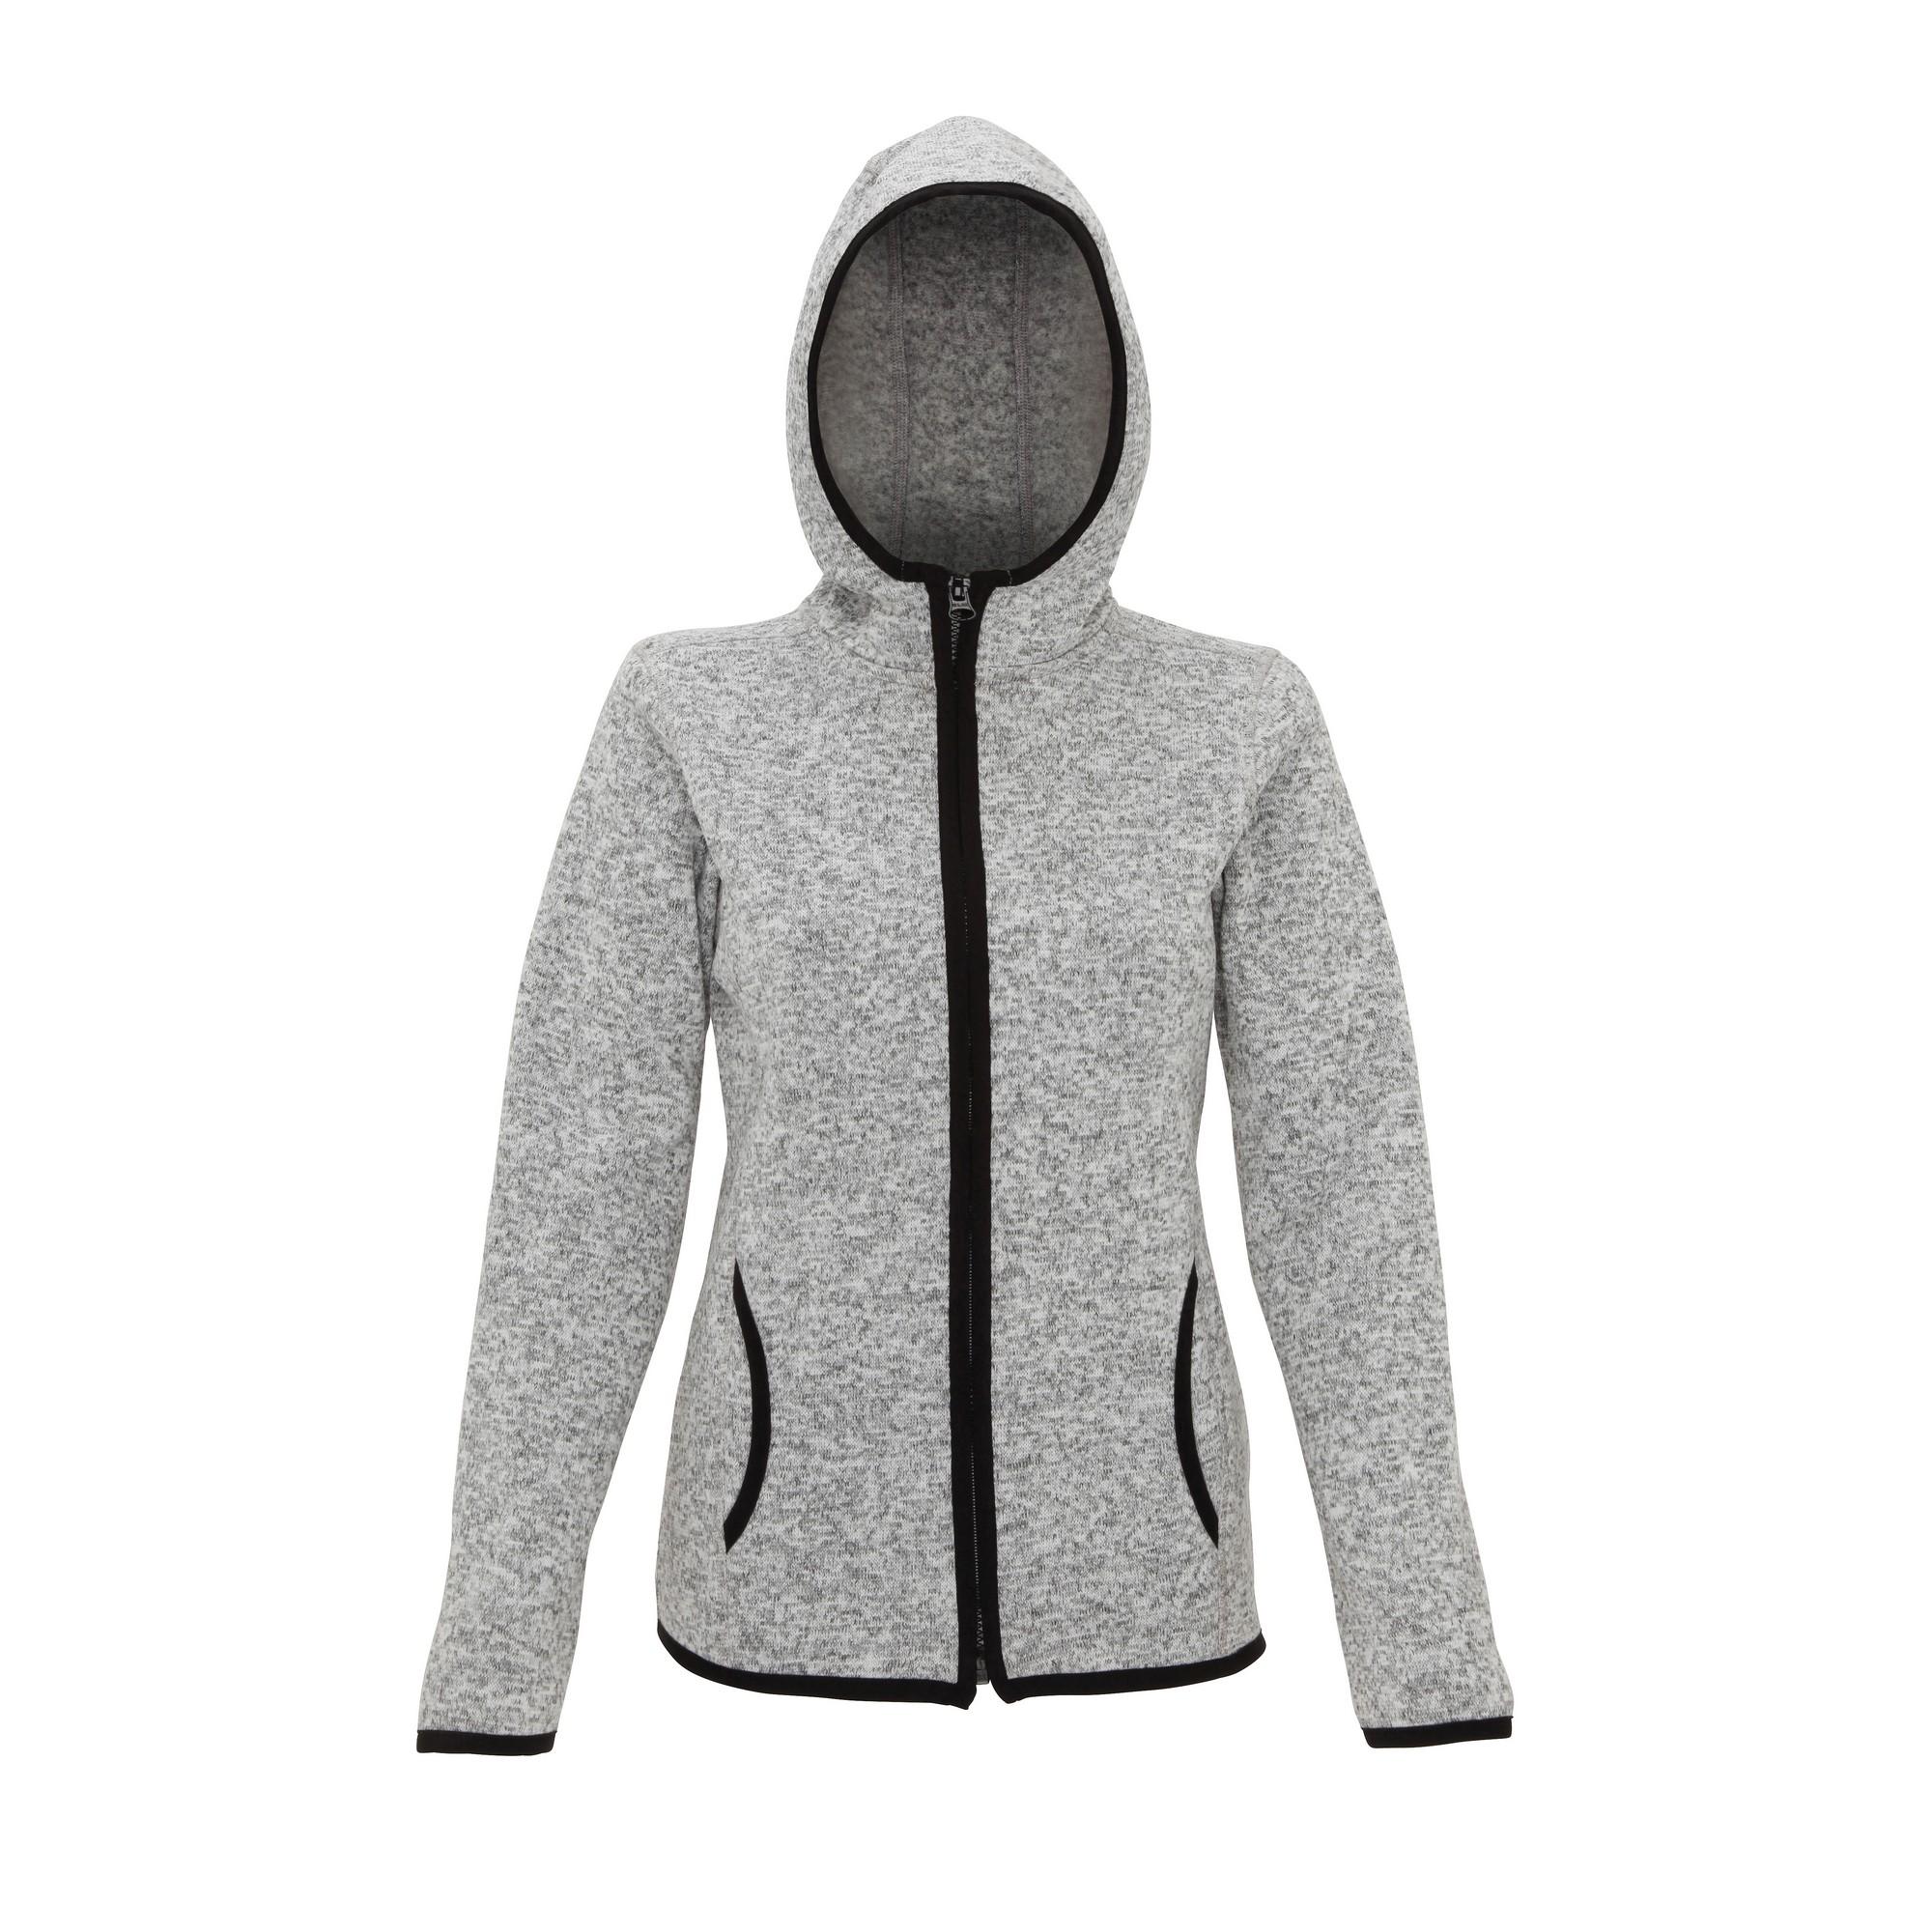 Tri Dri Womens/Ladies Melange Knit Fleece Jacket (XS) (Charcoal/Black Fleck)